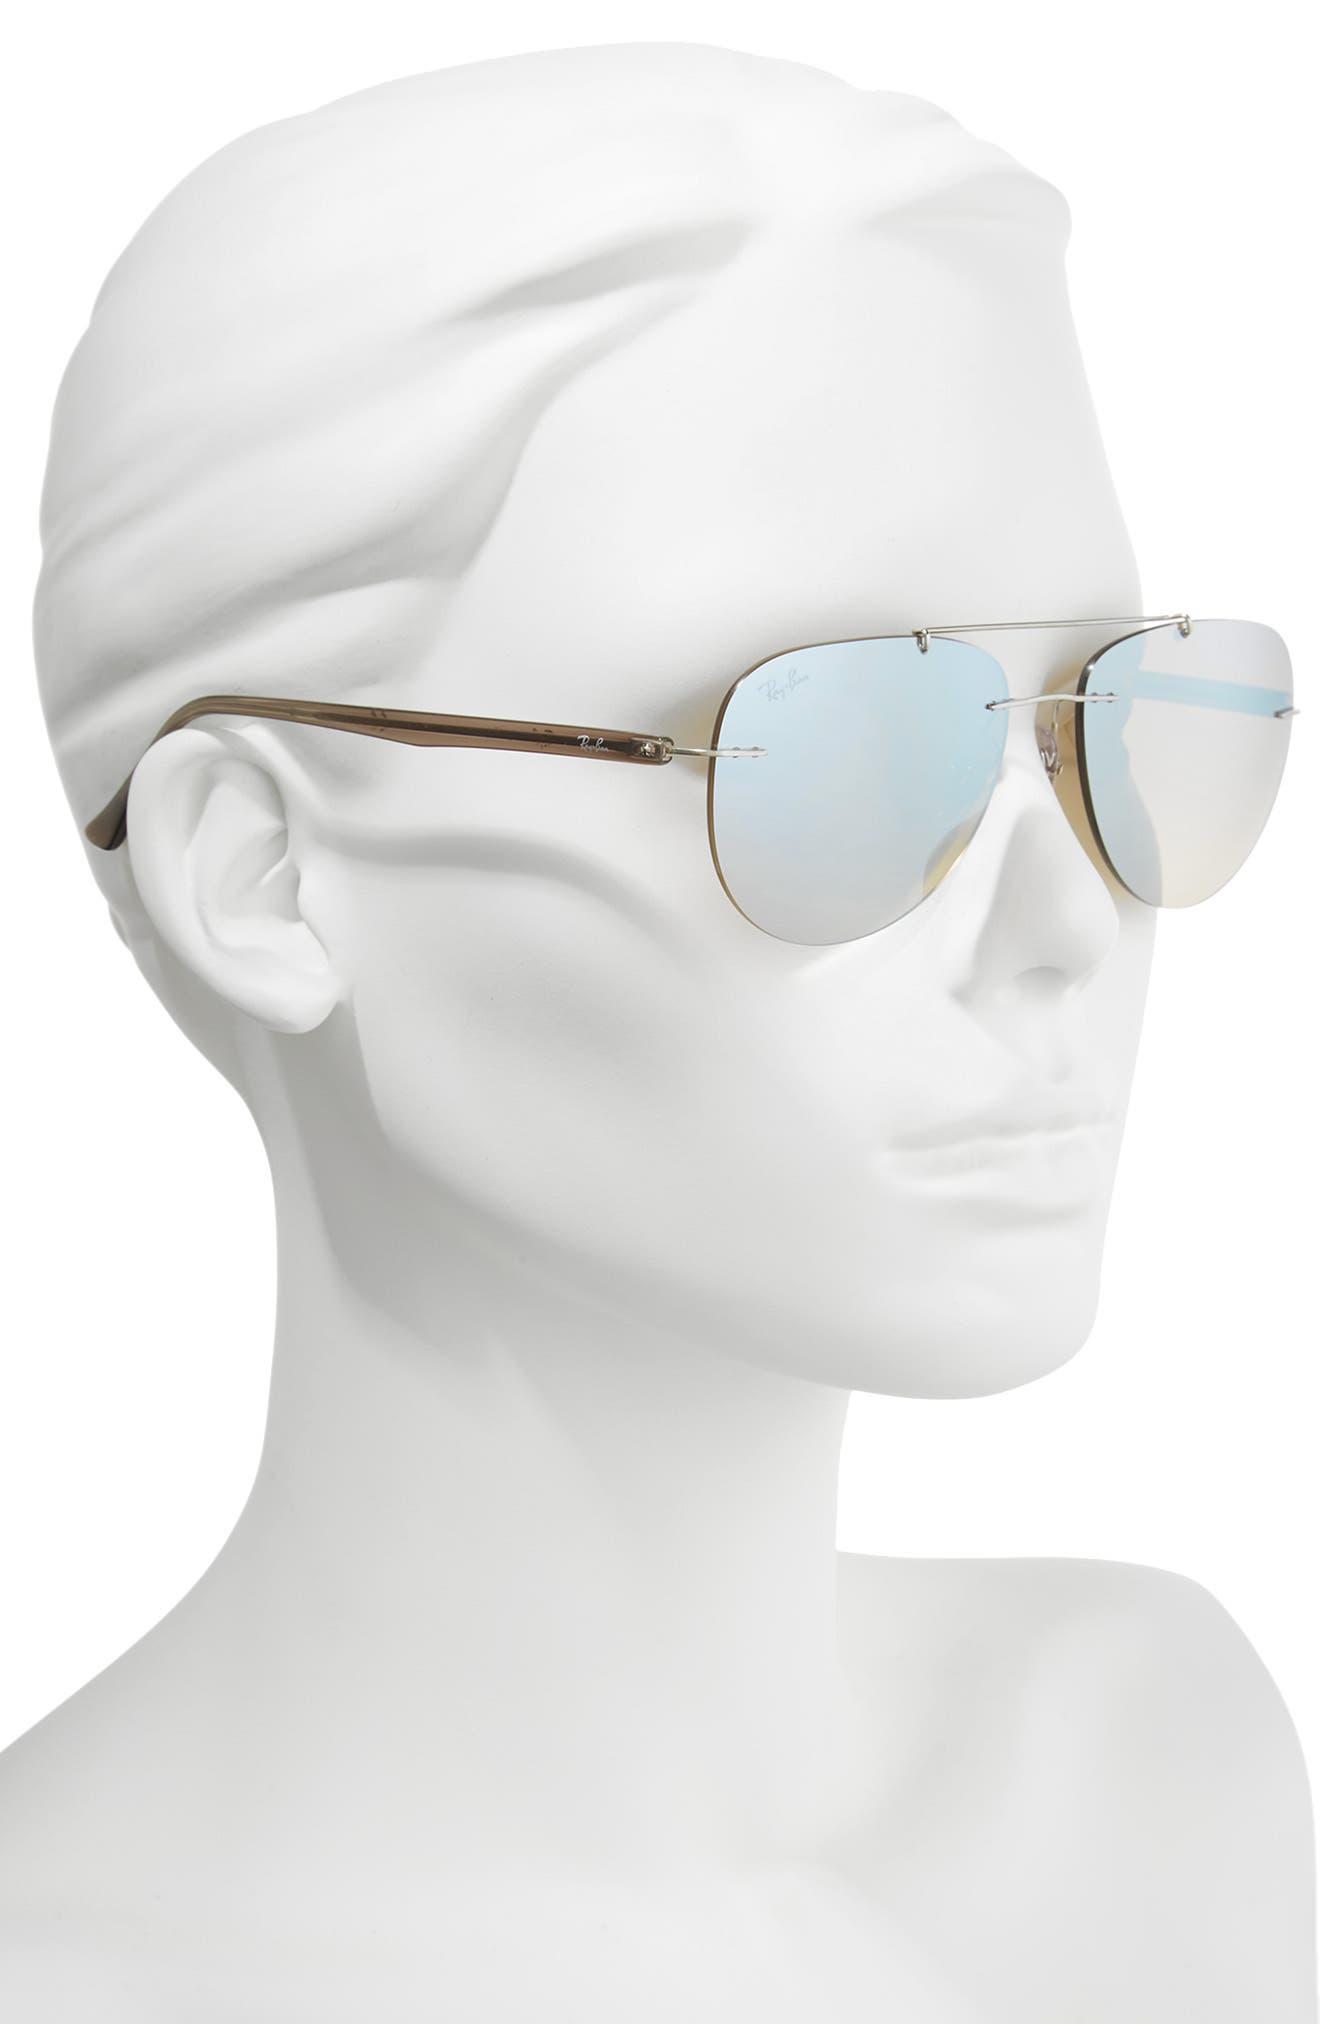 Phantos 57mm Mirrored Rimless Aviator Sunglasses,                             Alternate thumbnail 3, color,                             Silver